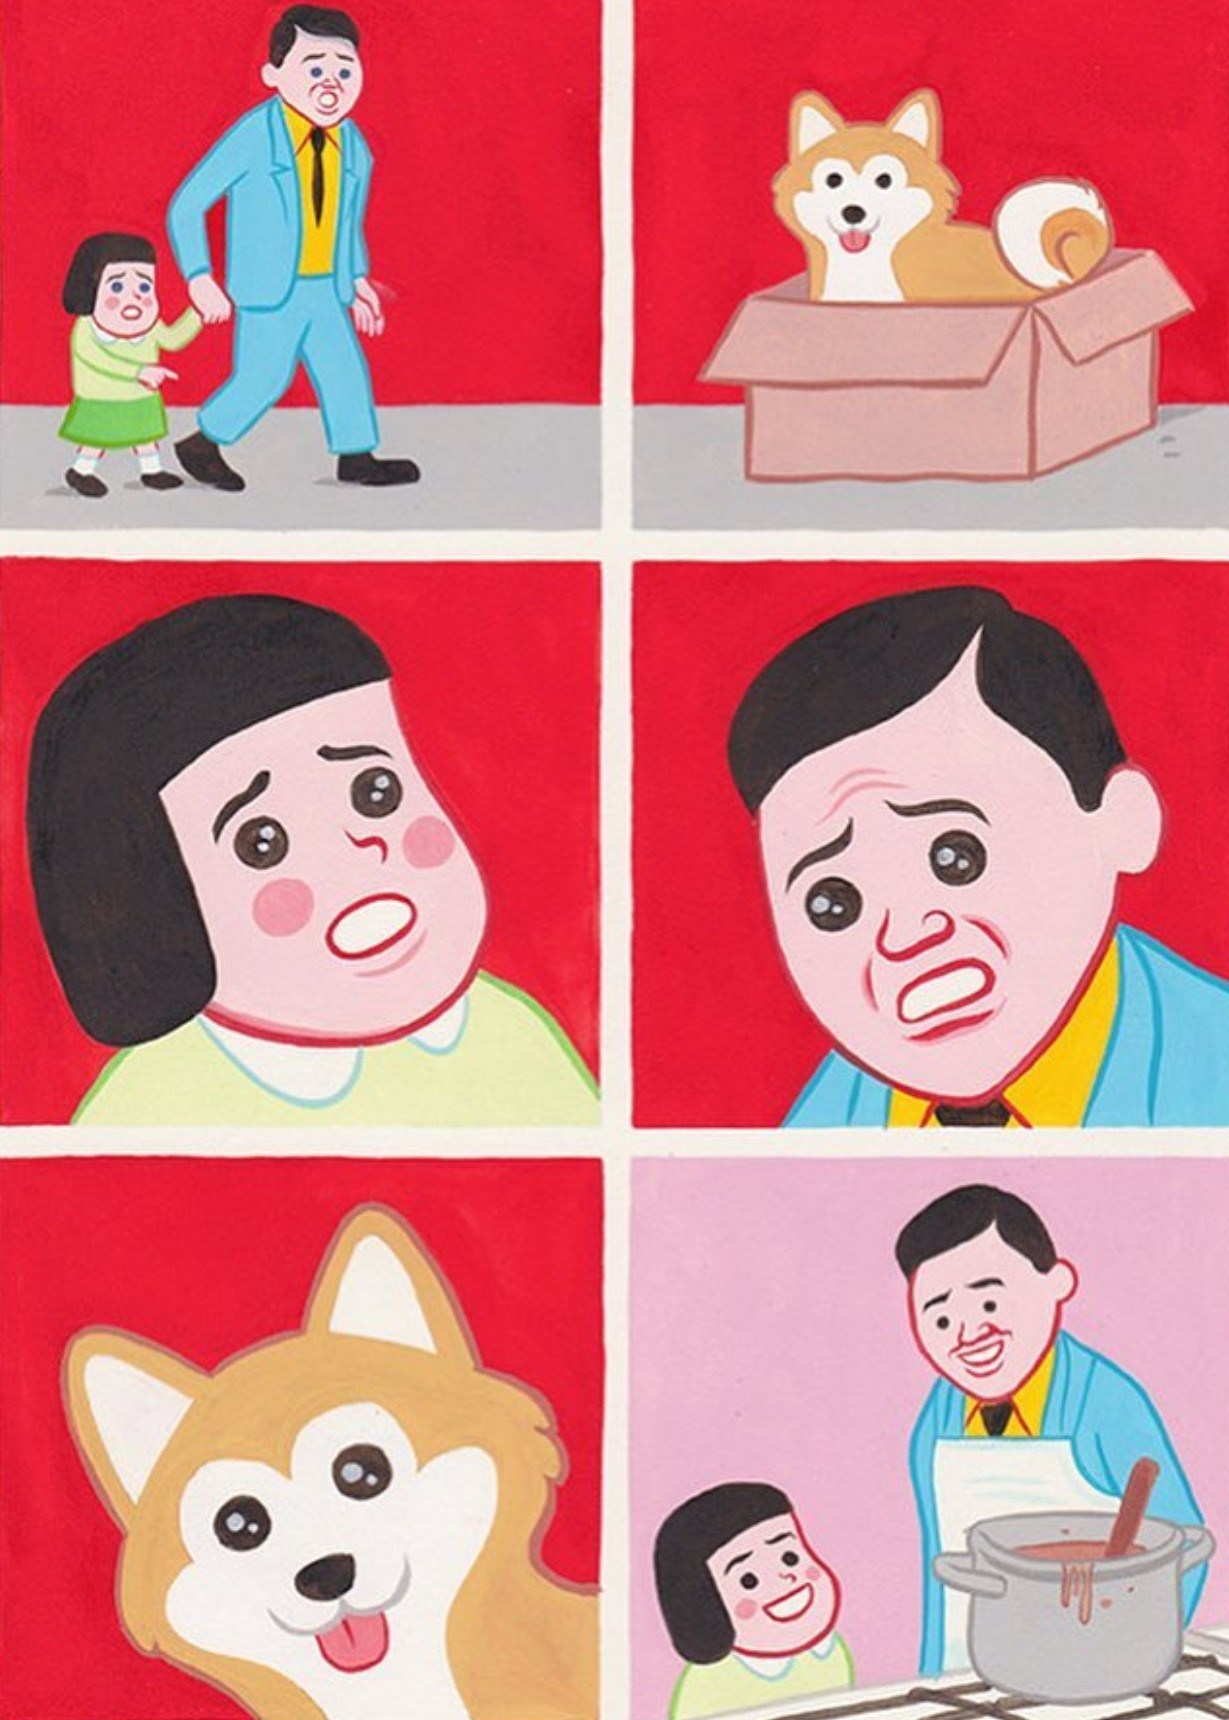 Doggo soup. - meme